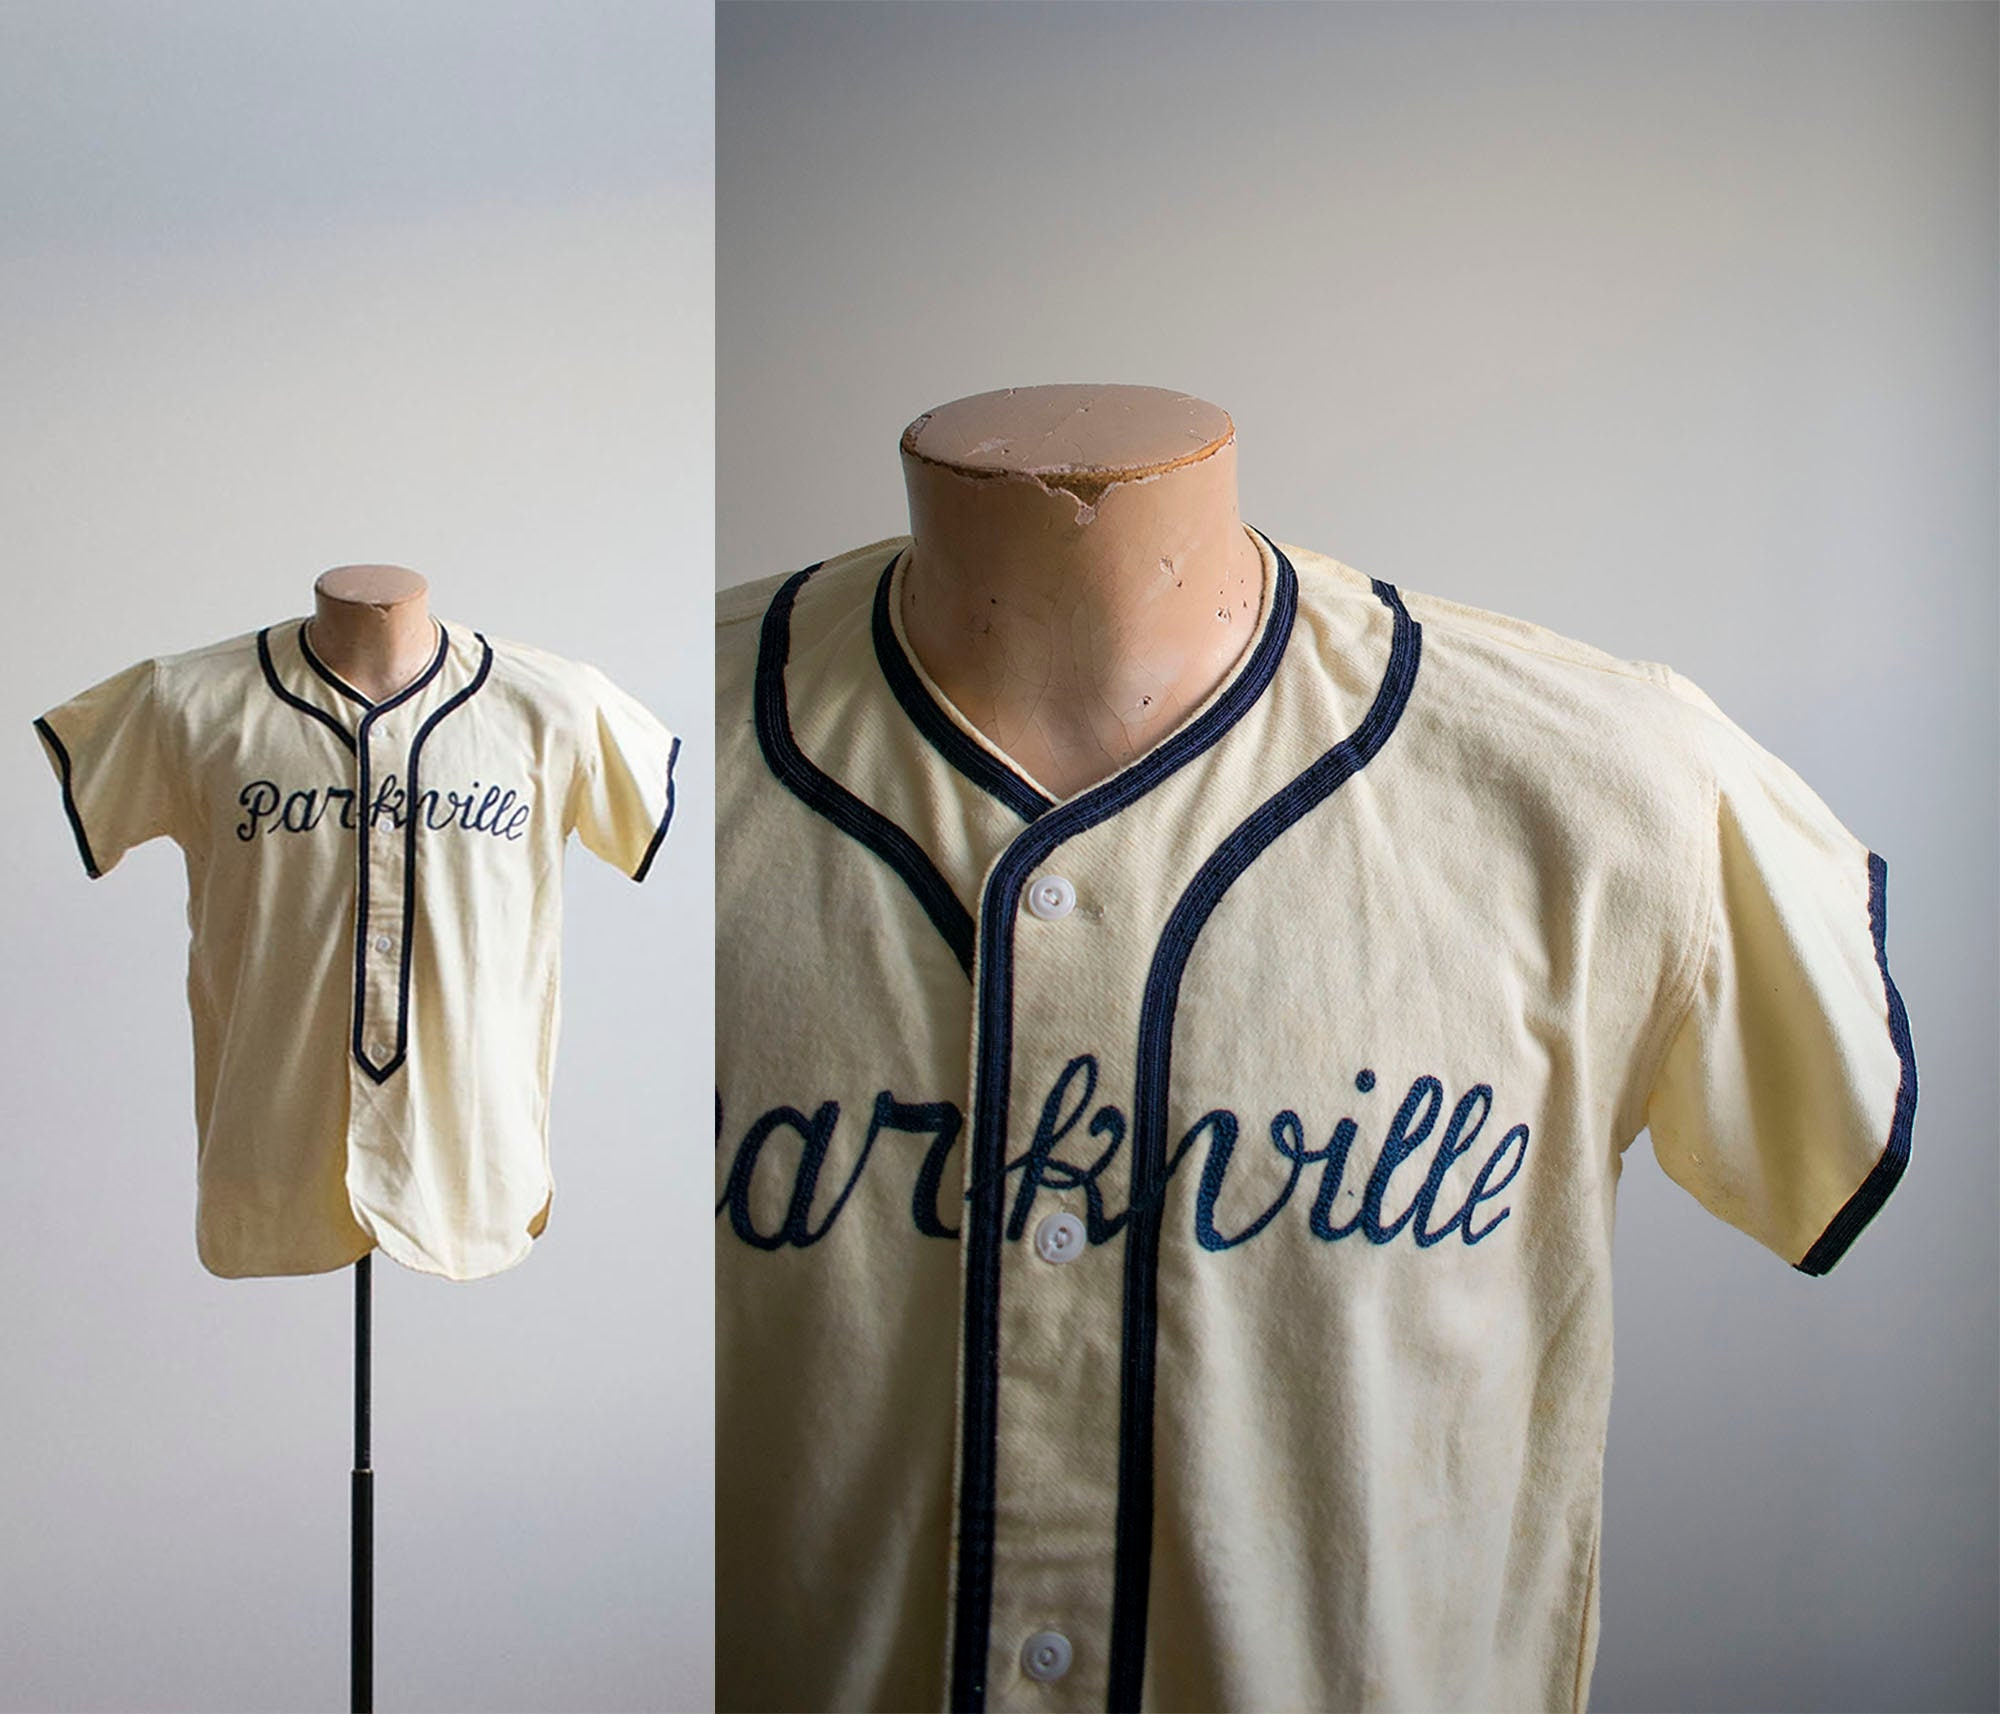 1960s – 70s Men's Ties | Skinny Ties, Slim Ties Vintage 1960S Little League ShirtBaseball Uniform Baltimore Maryland Chainstitched $0.00 AT vintagedancer.com